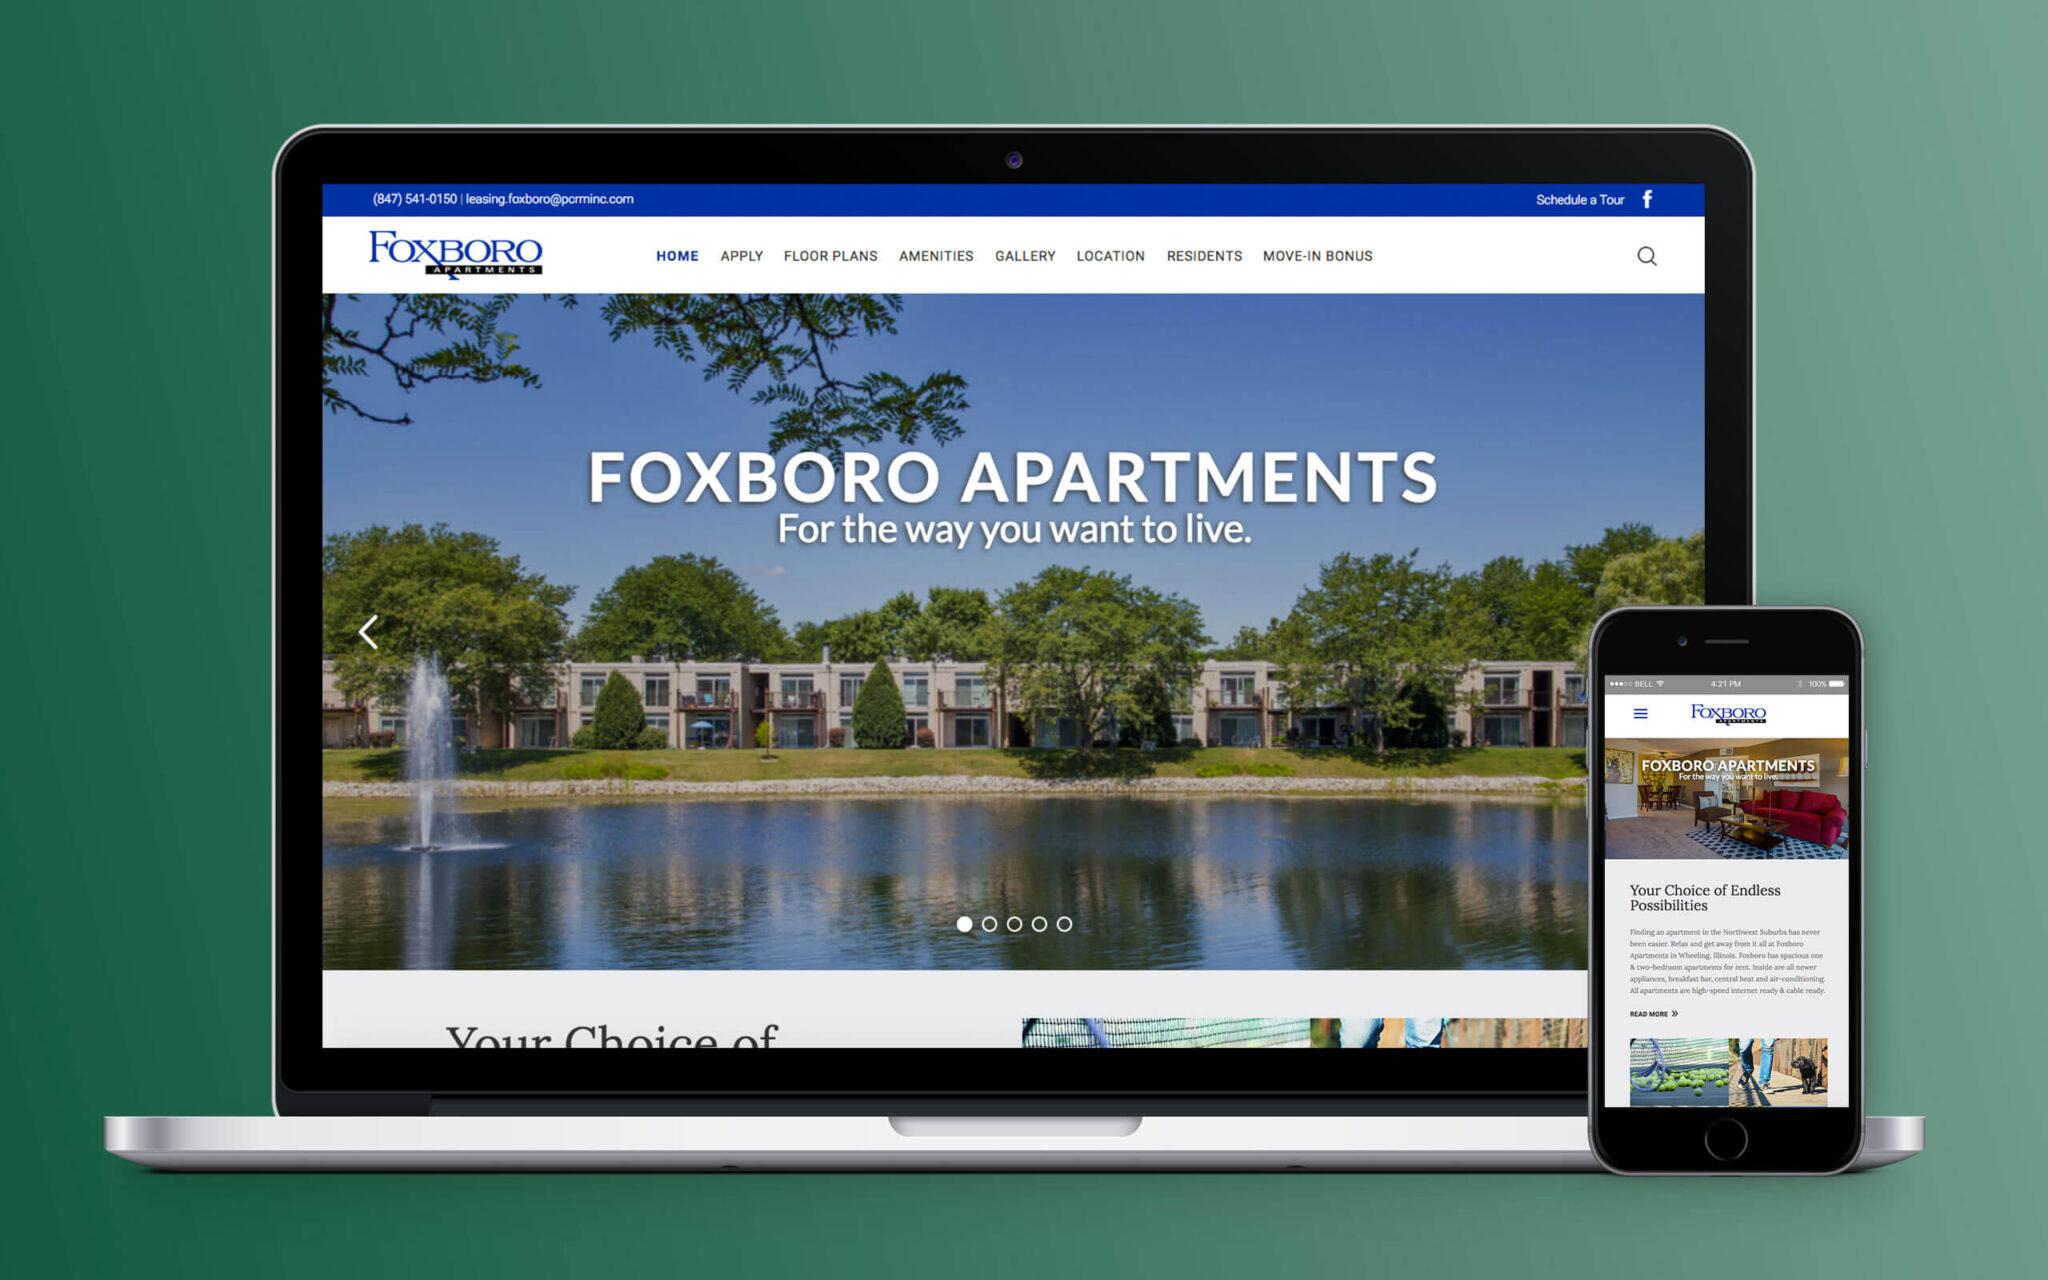 Foxboro Apartments Website Home